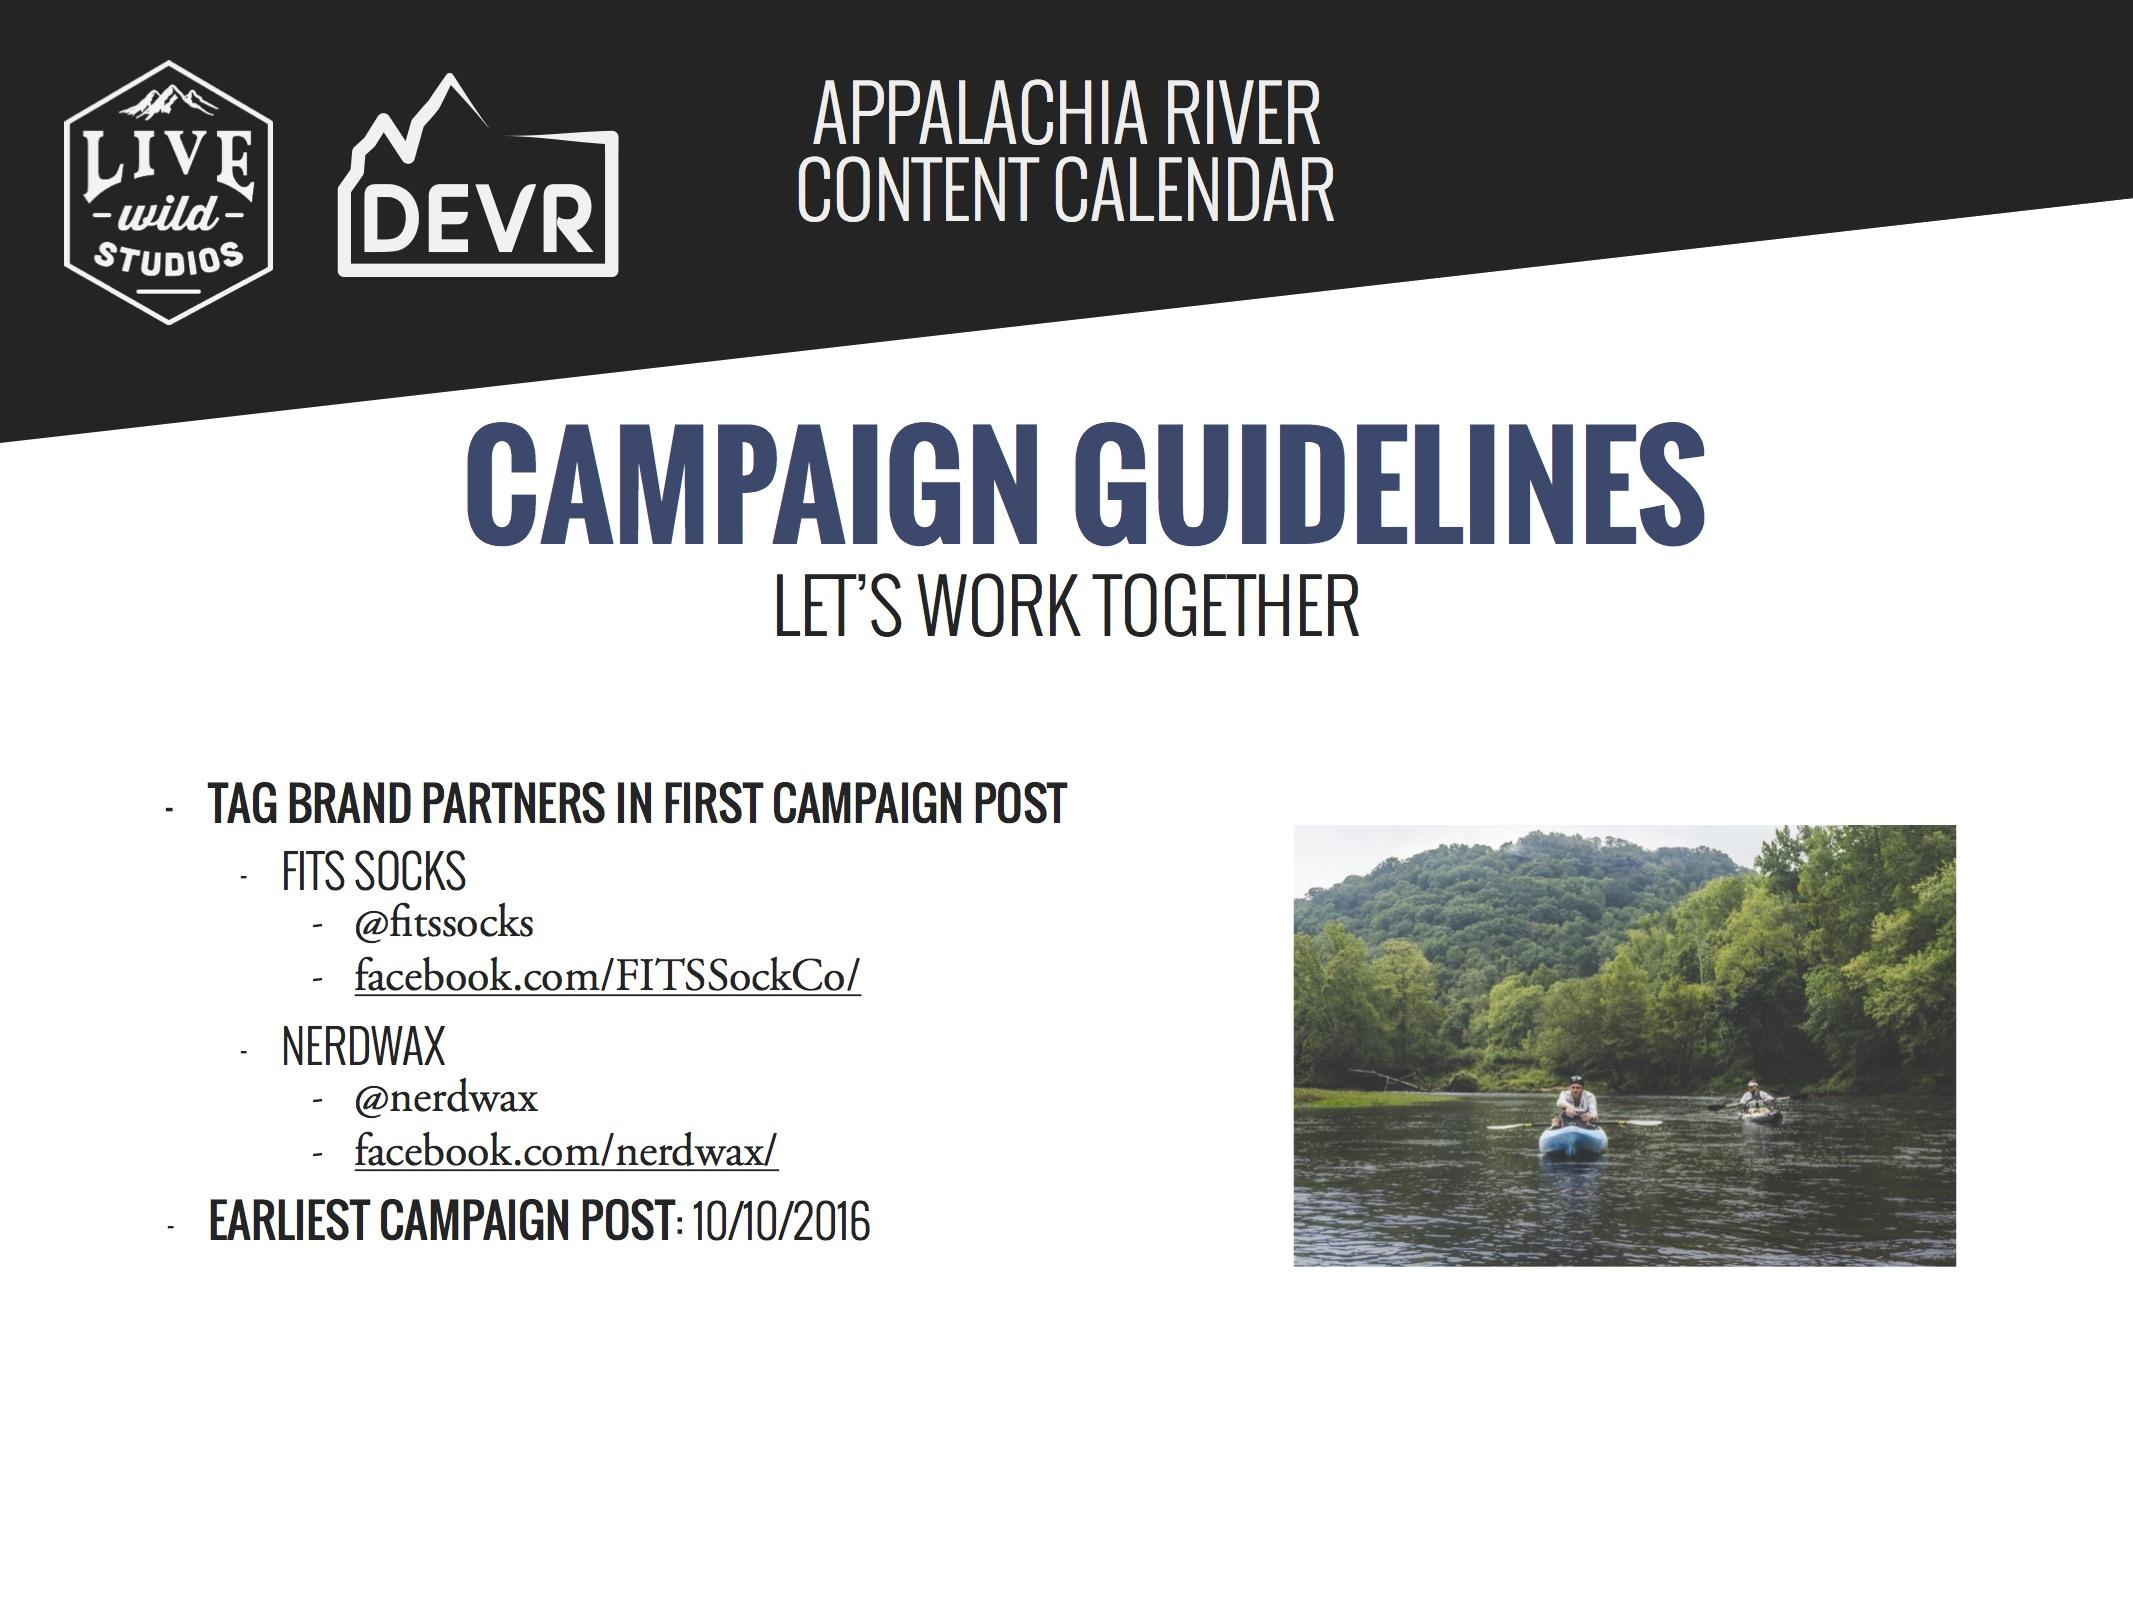 Appalachia River Adventure 2016 Campaign Guide 2.jpg